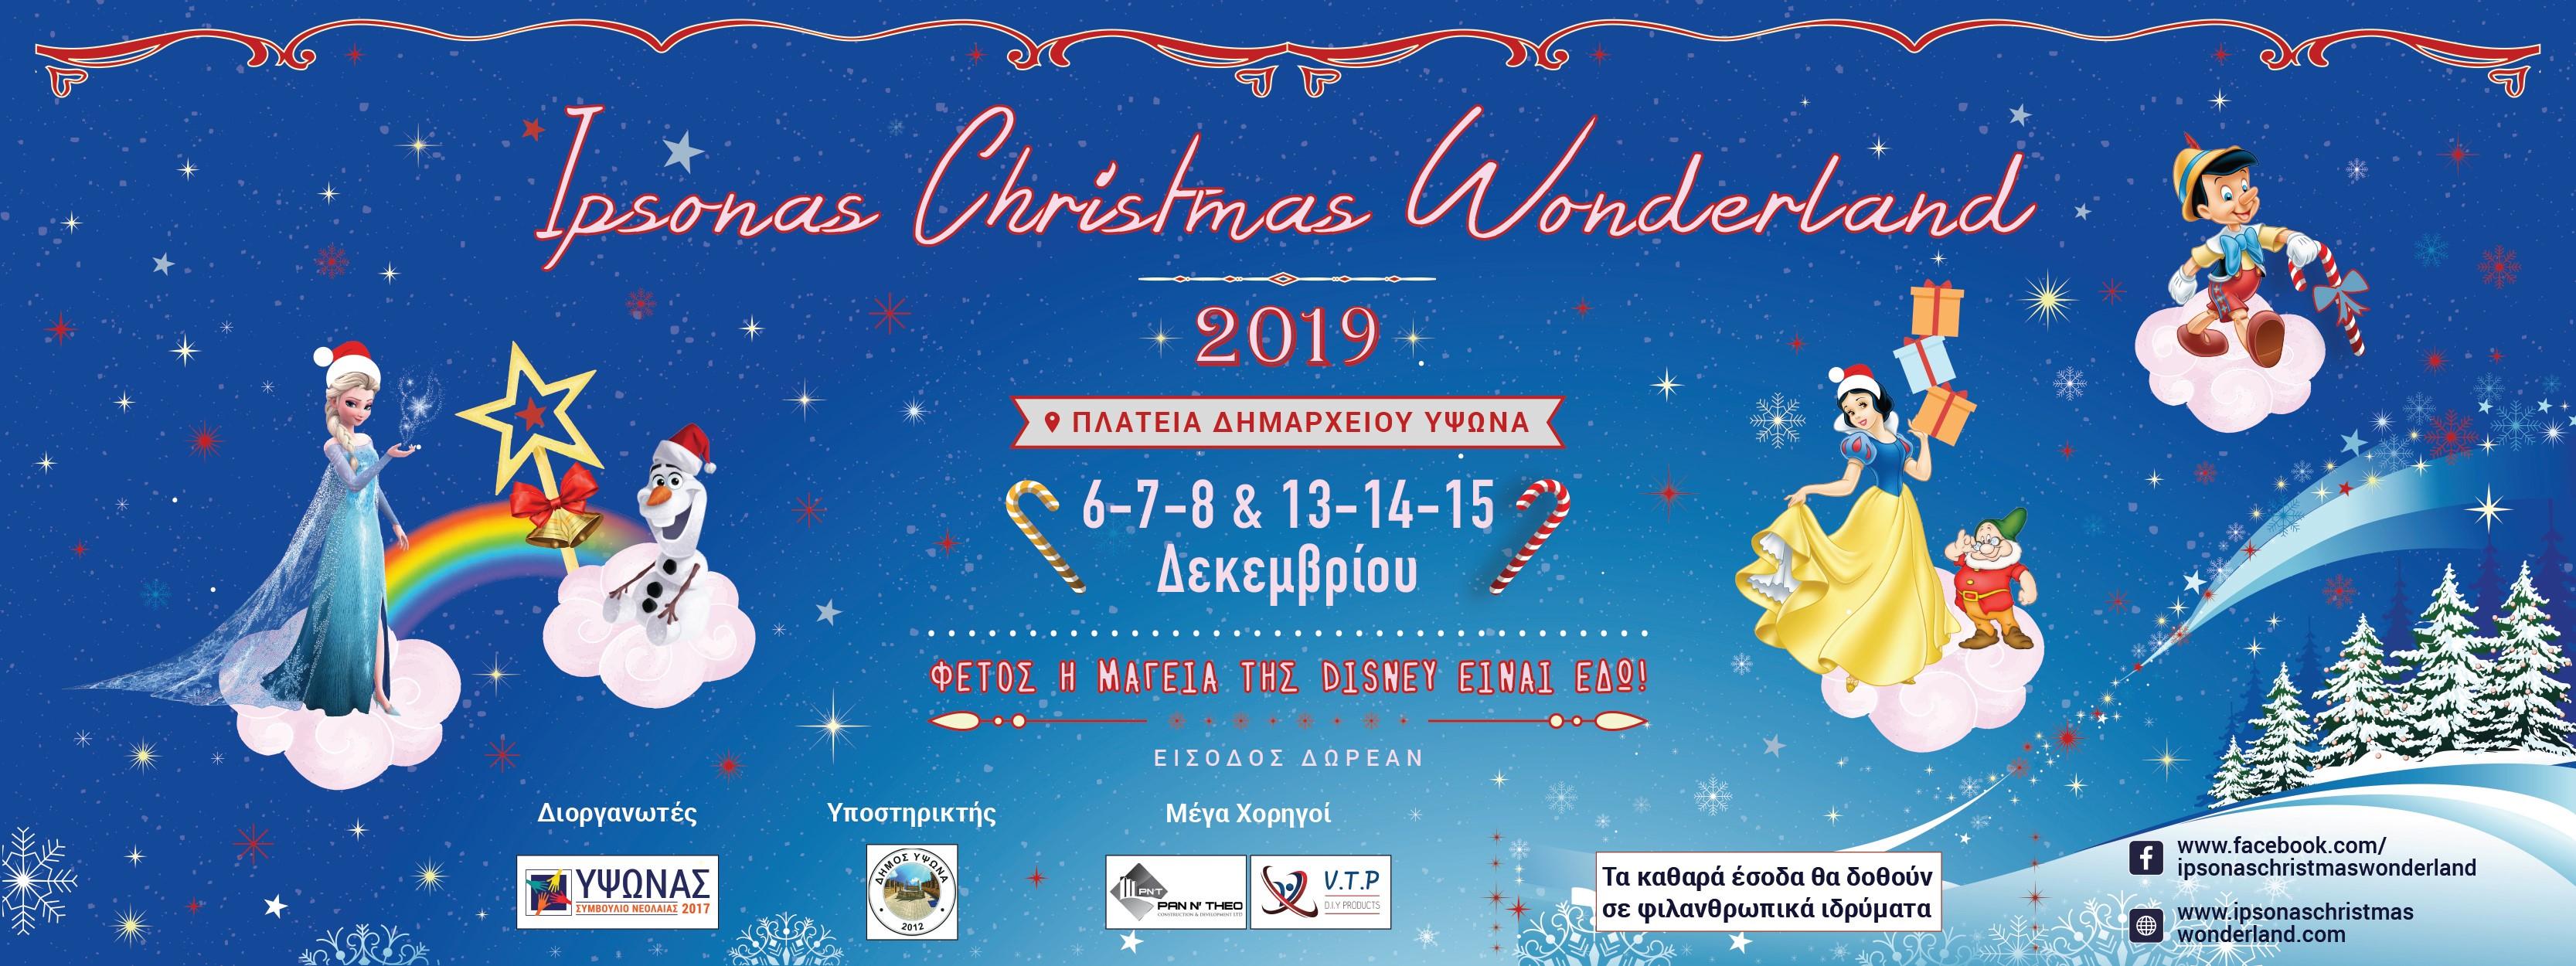 Ipsonas Christmas Wonderland 2019